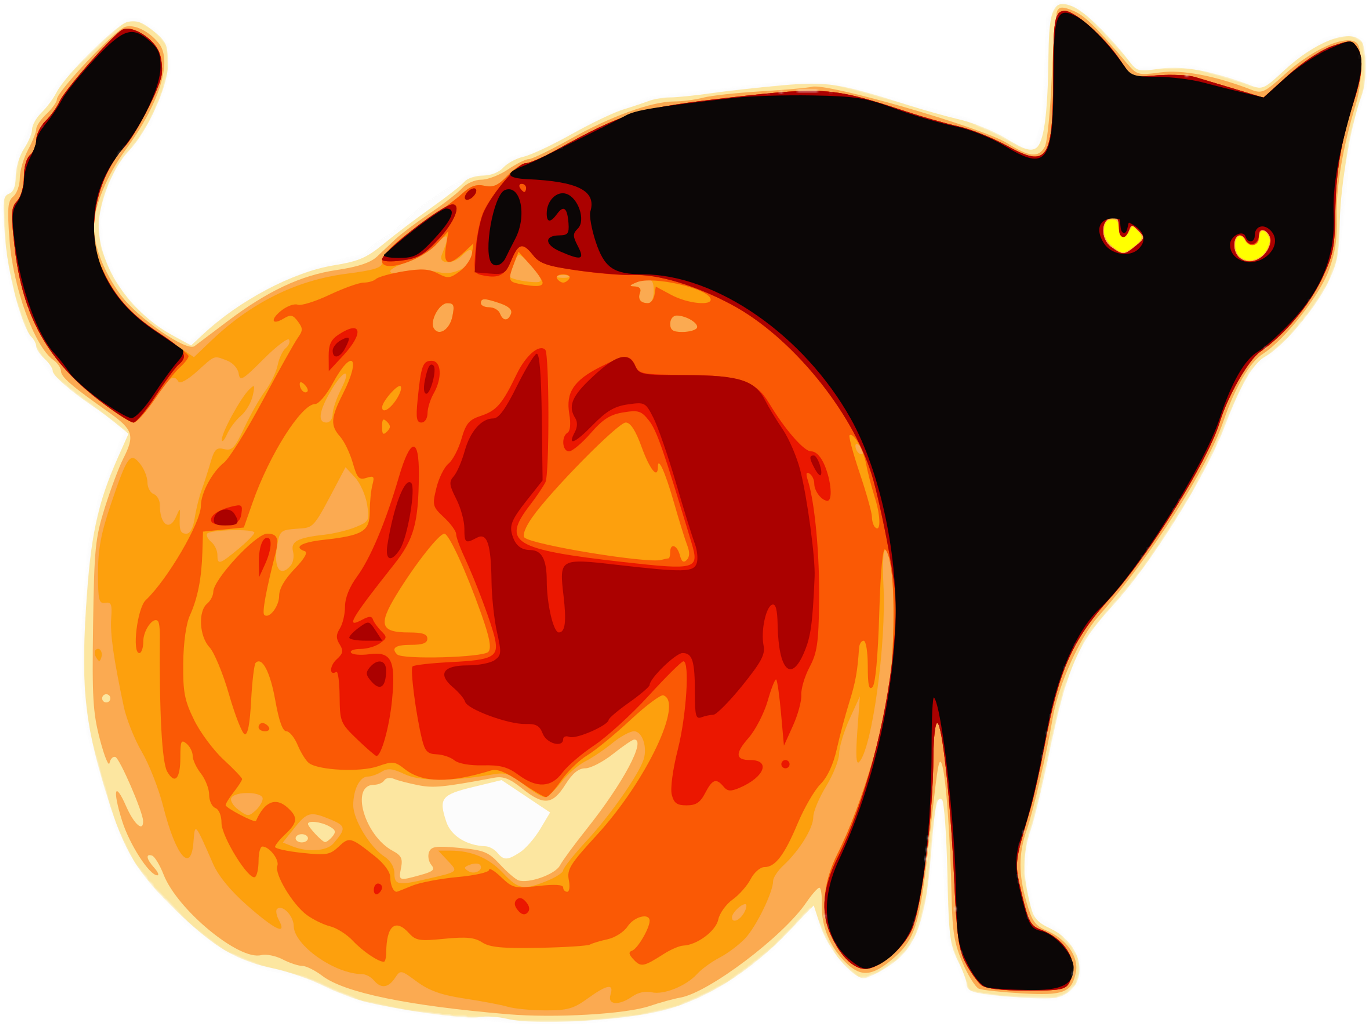 Jackolantern lantern jack halloween. Pumpkin clipart creepy